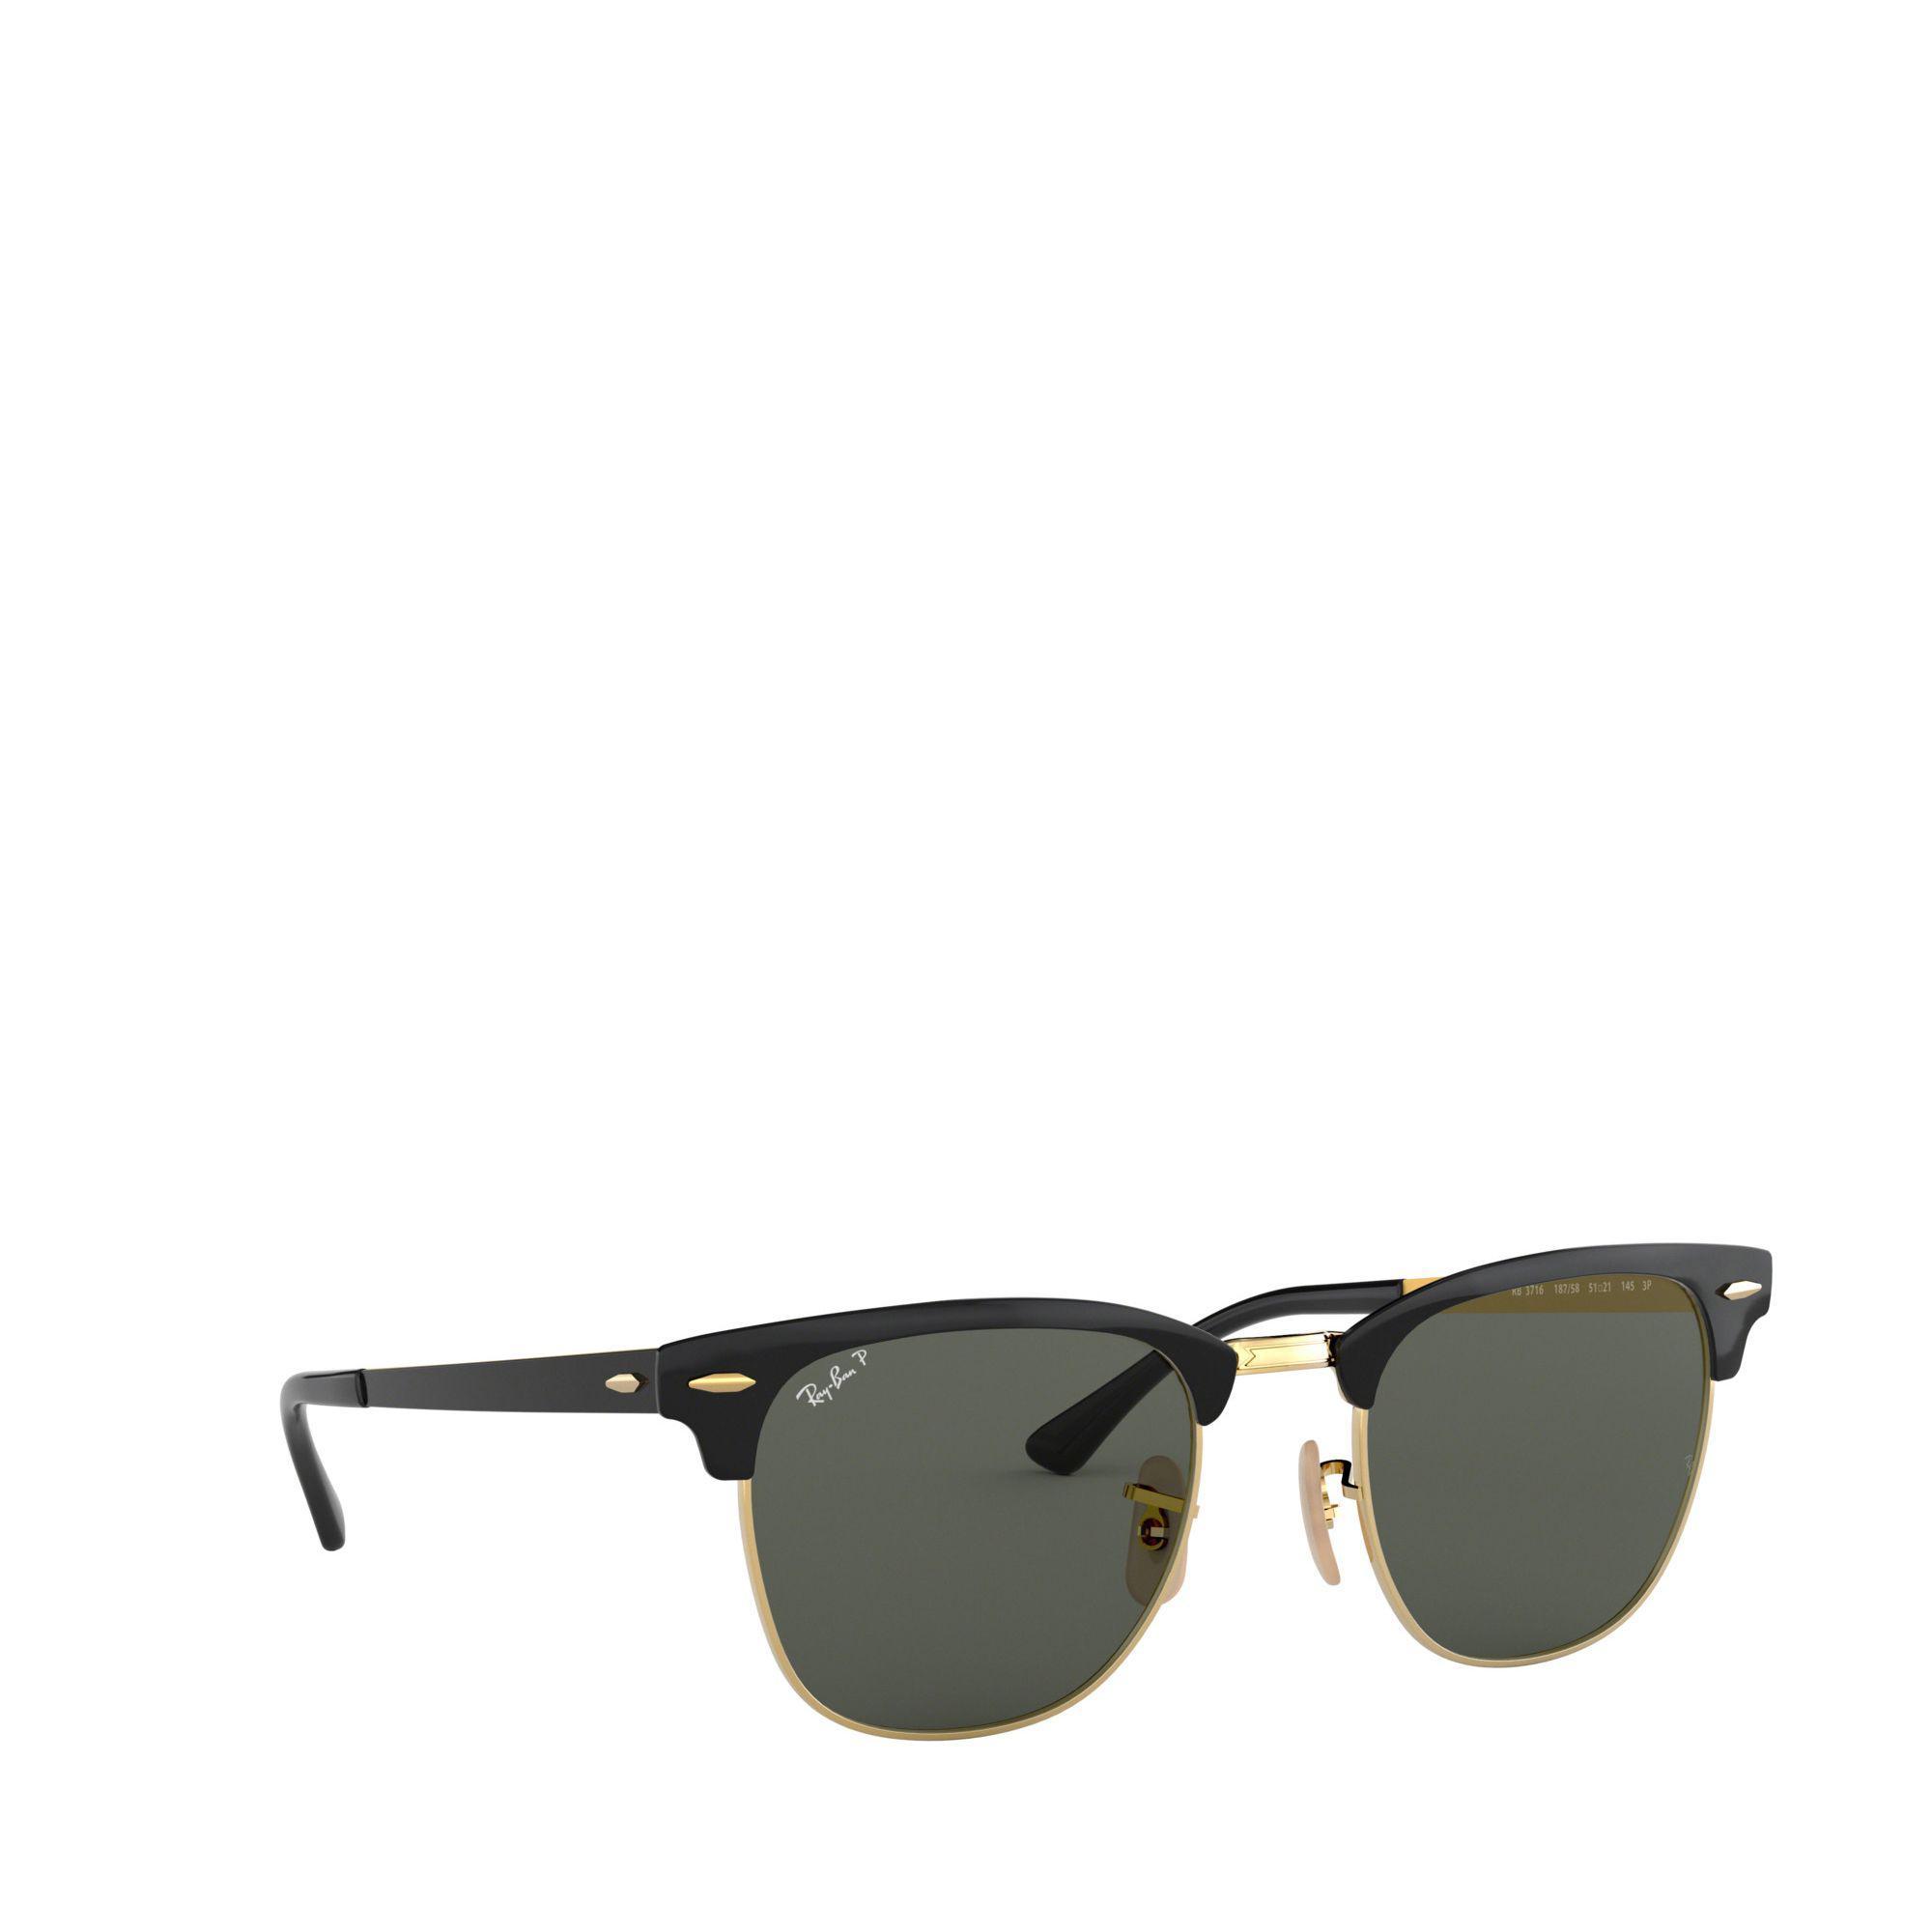 5e041358040e Ray-Ban Black 0rb3716 Square Sunglasses in Black for Men - Lyst